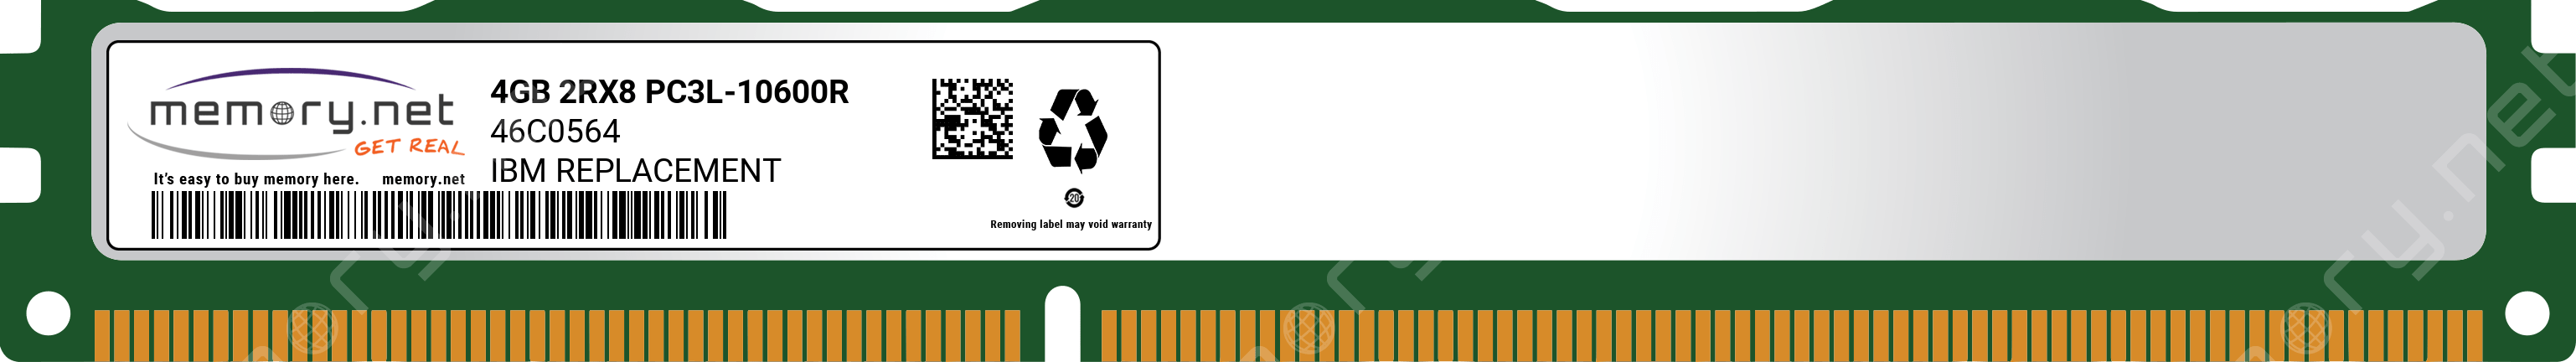 46C0564